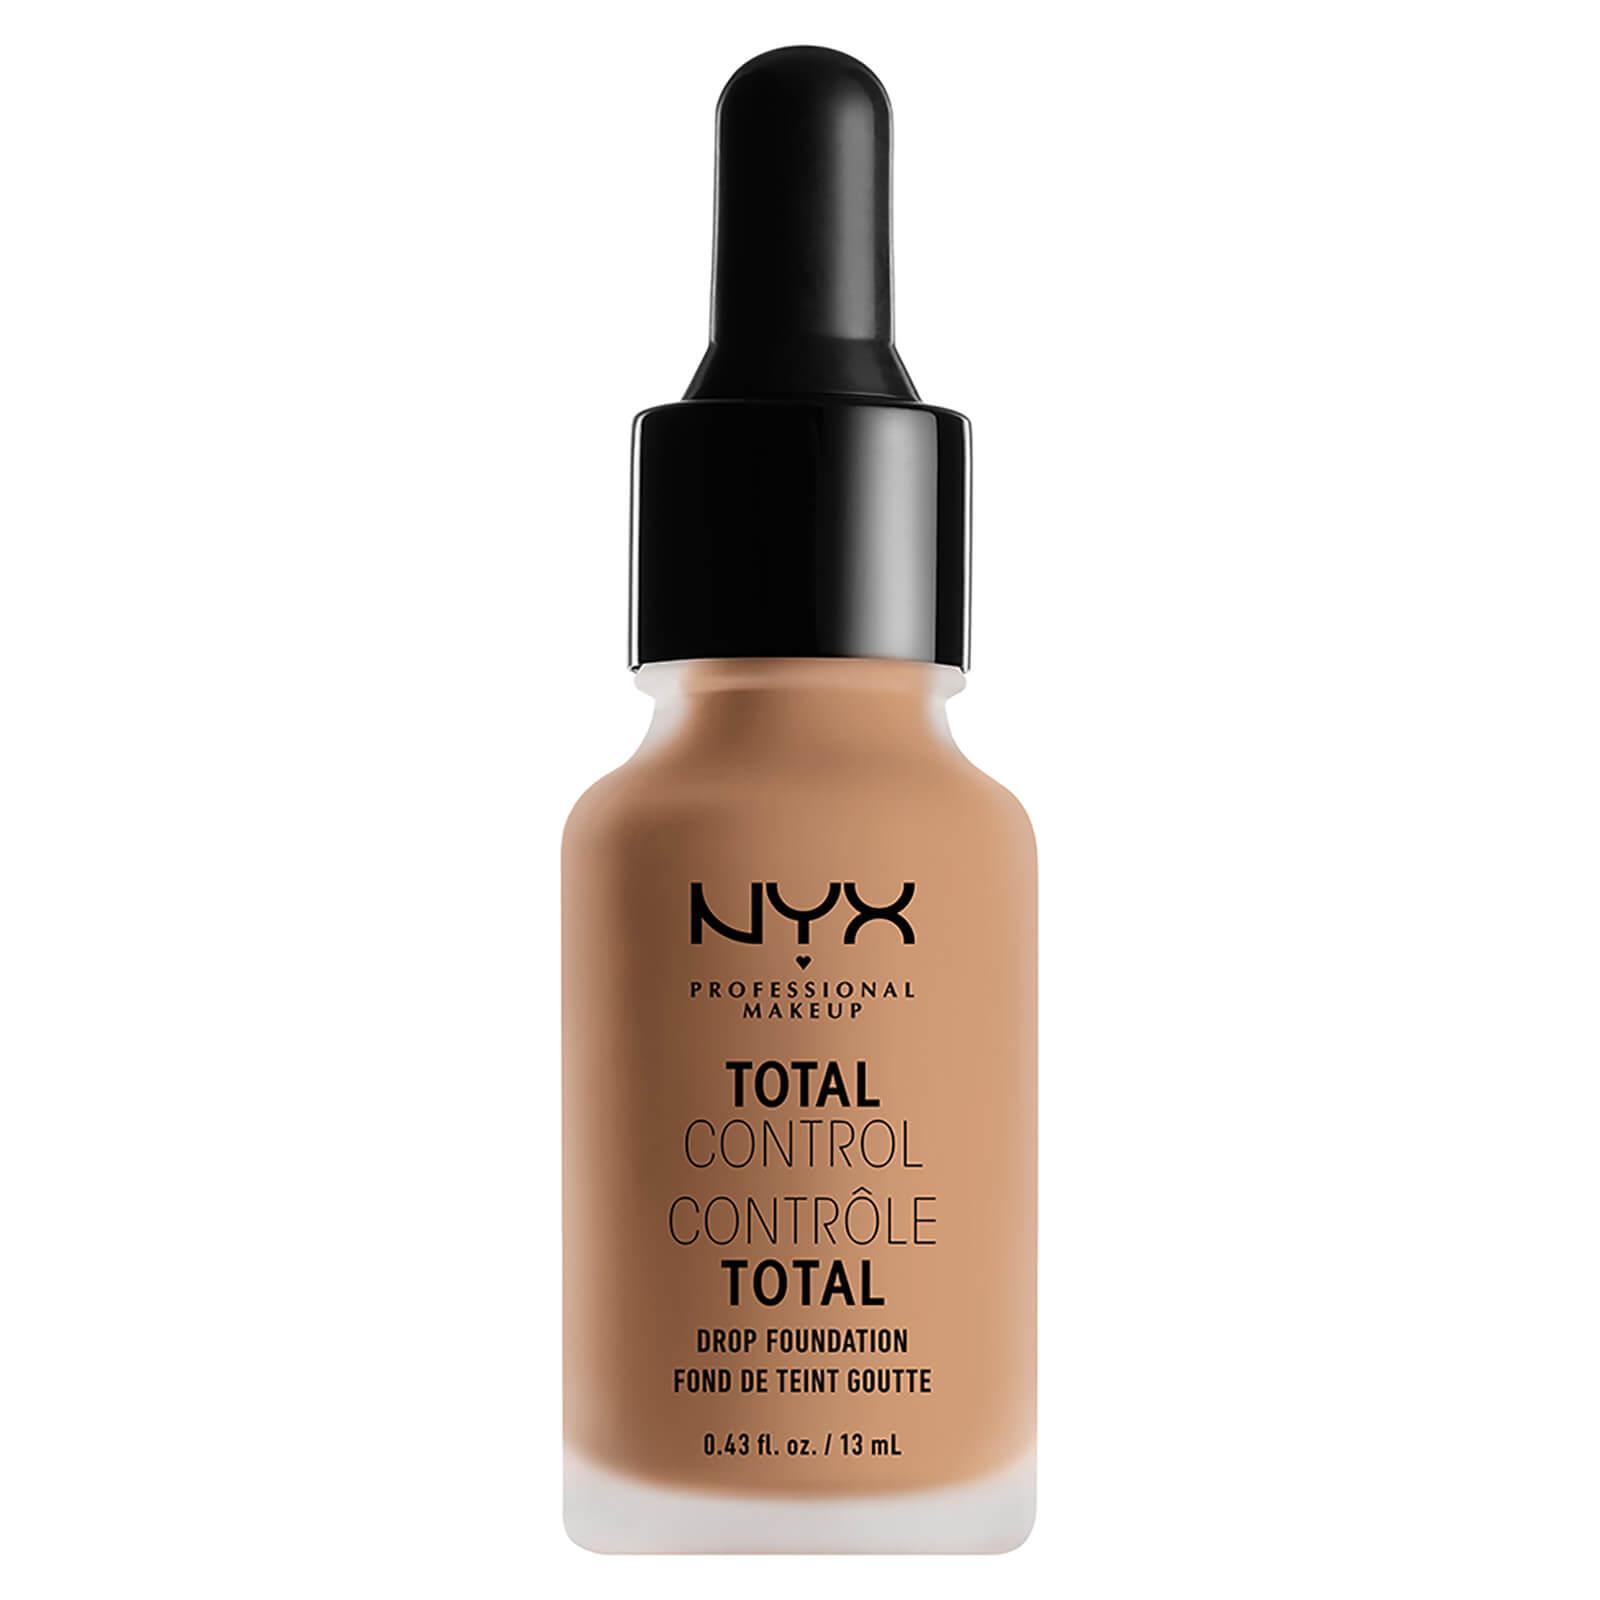 NYX Professional Makeup Total Control Drop Foundation (Various Shades) - Medium Olive